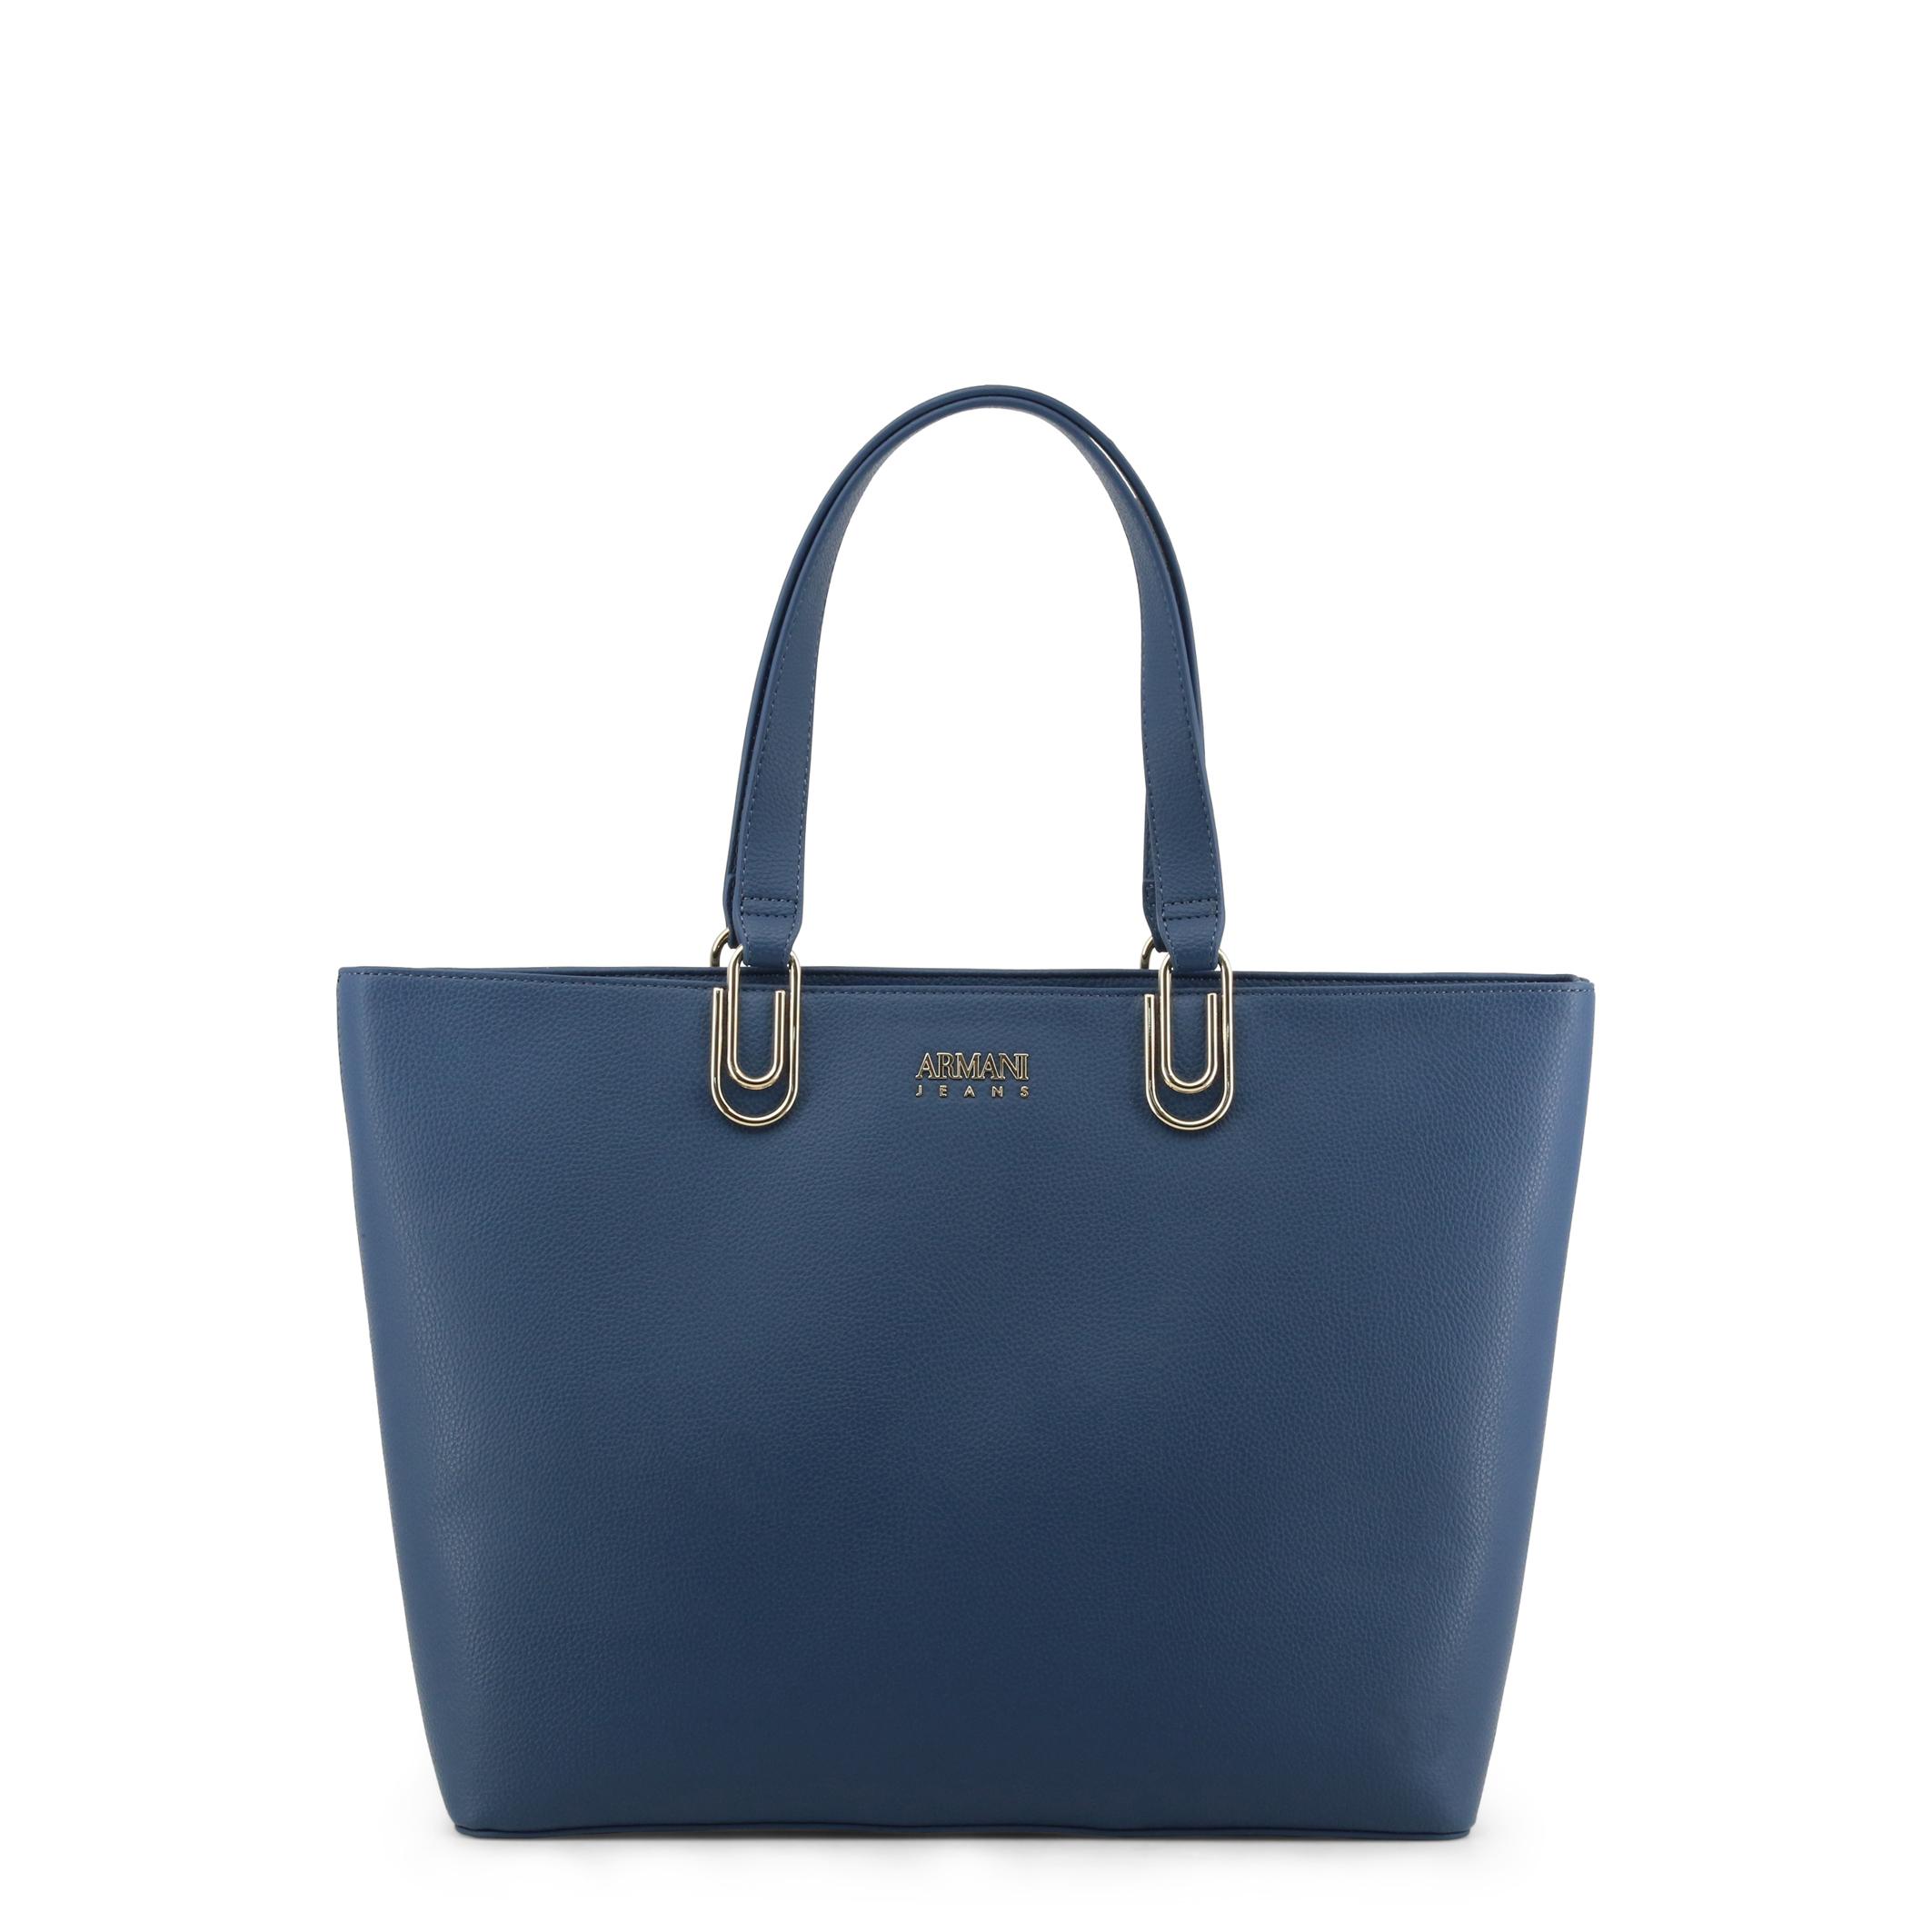 Shopping bag de Mujer Armani Jeans Azul